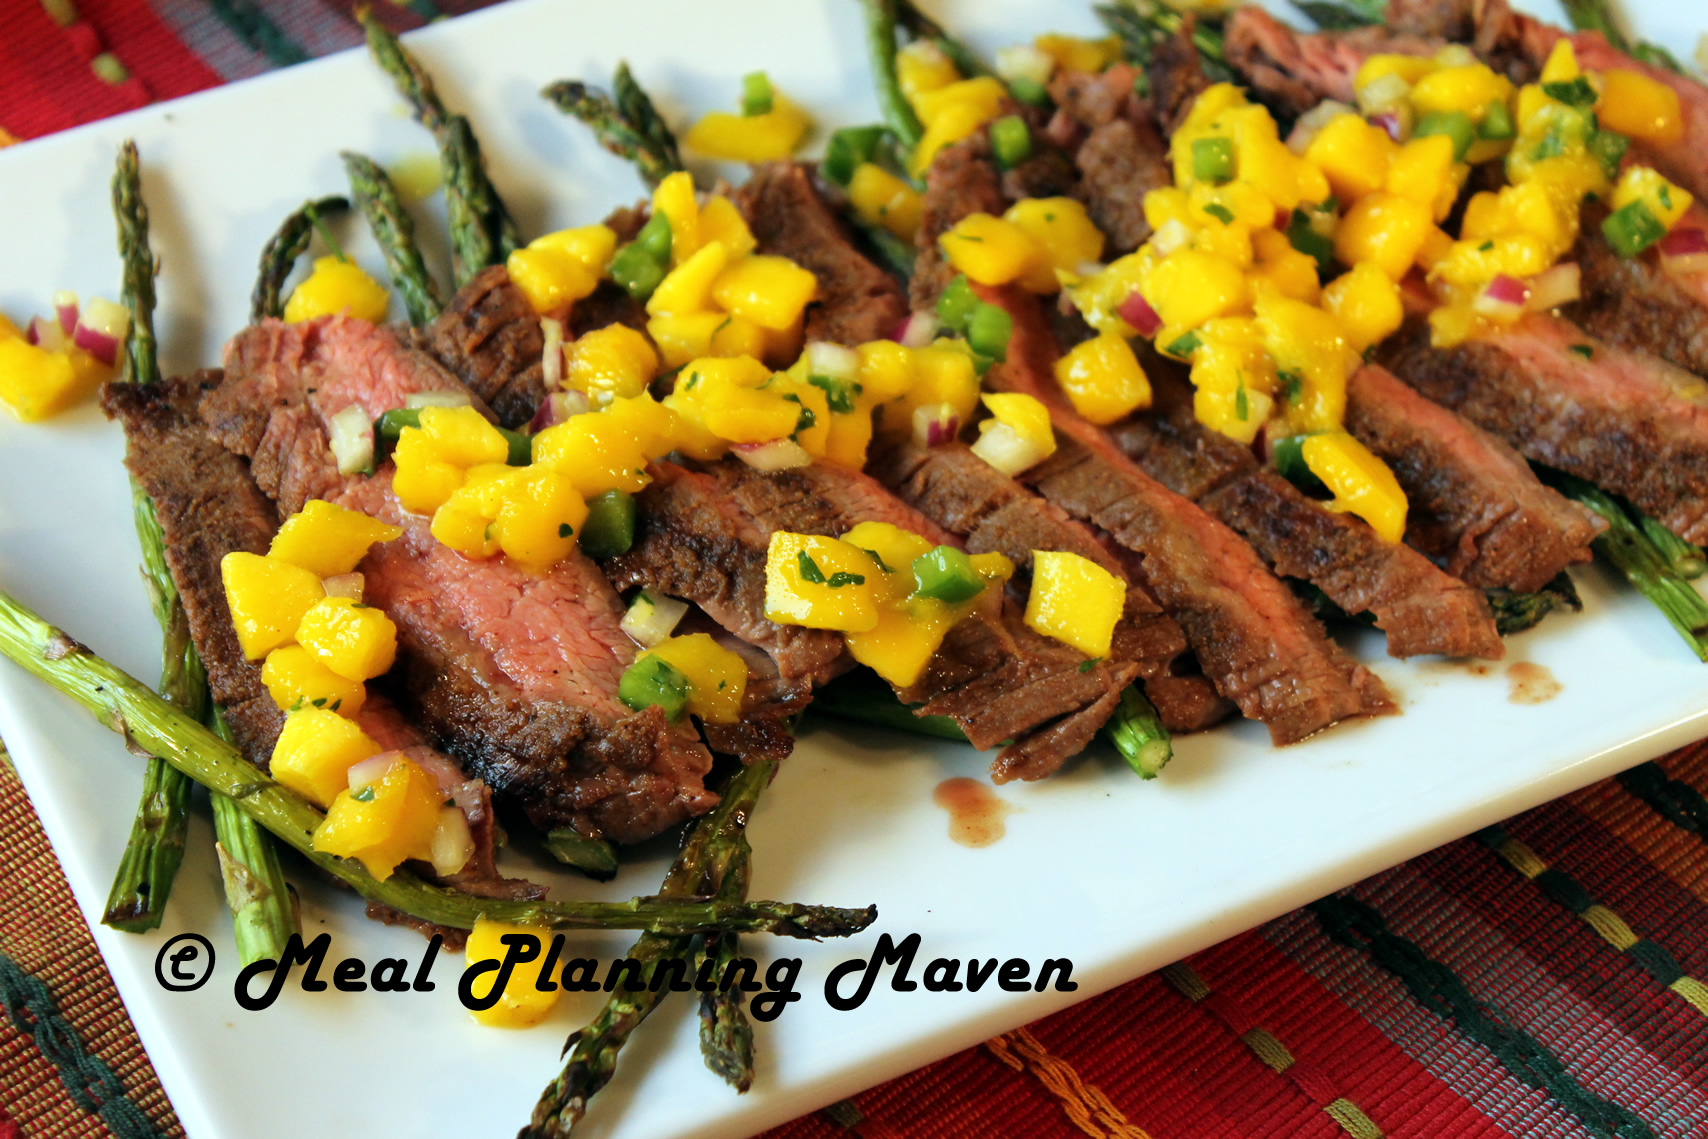 Southwestern Flank Steak with Mango Salsa